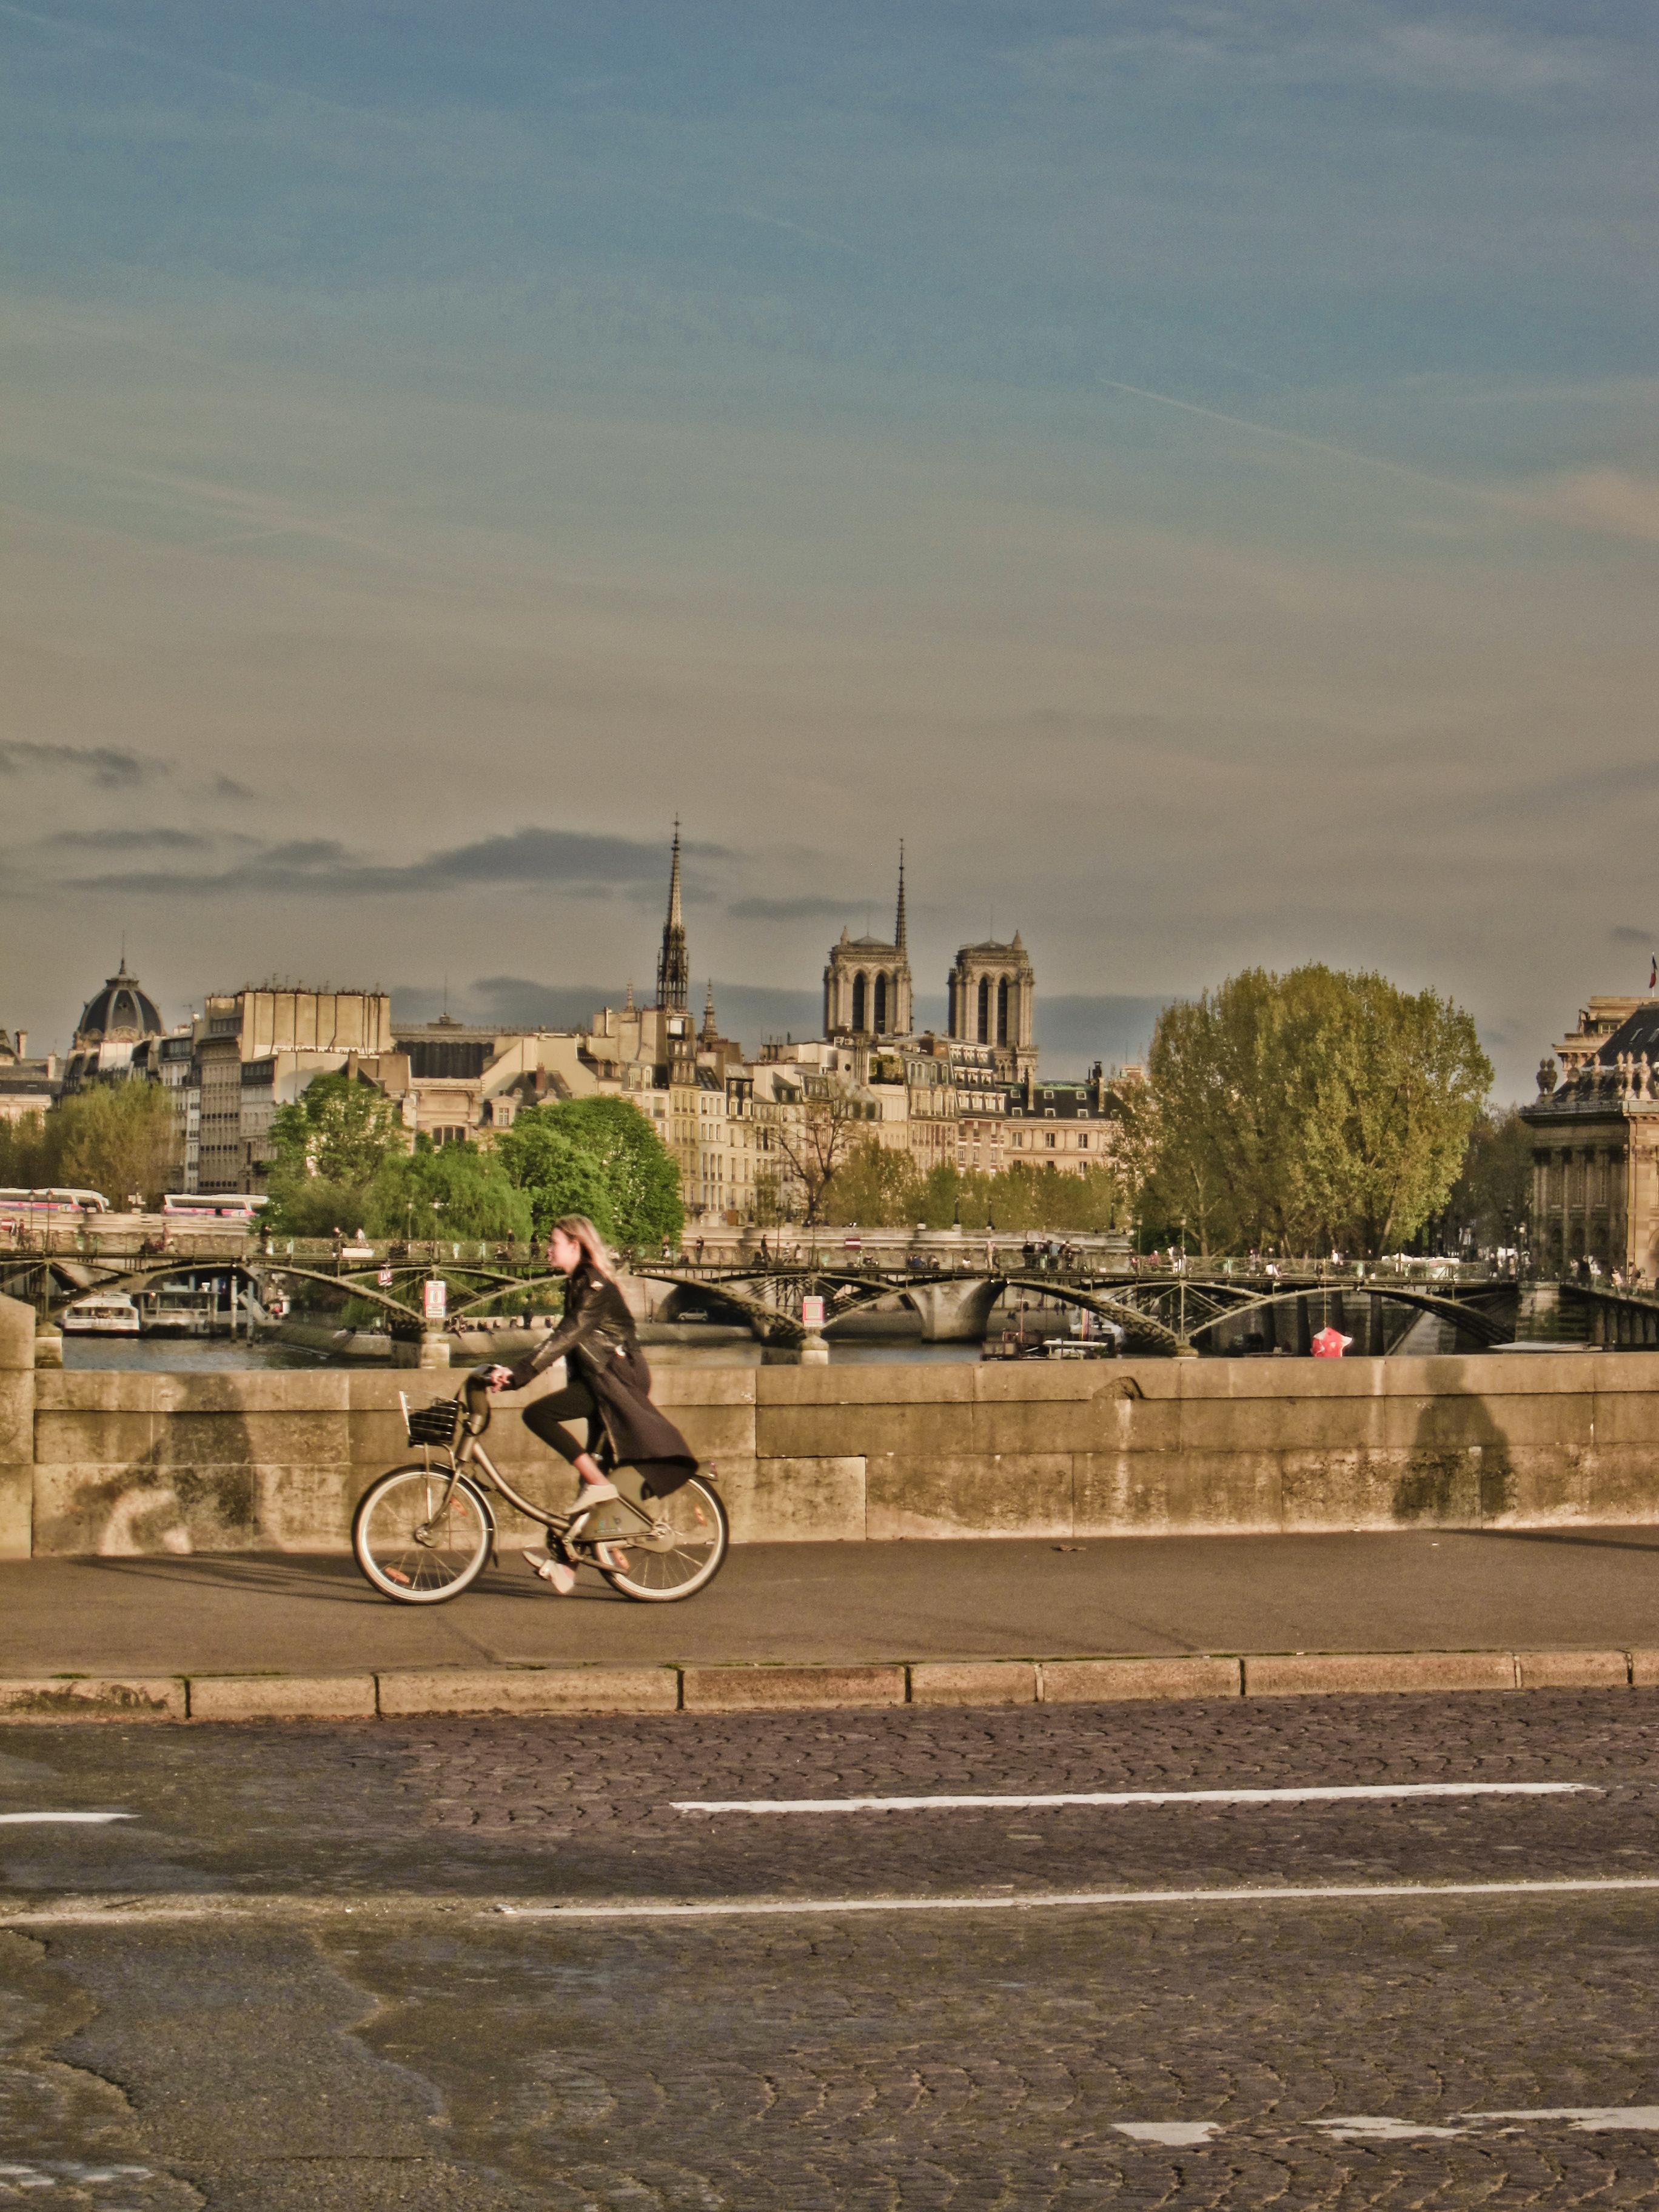 Bicycle Rider, Bicycle, Bridge, France, Paris, HQ Photo